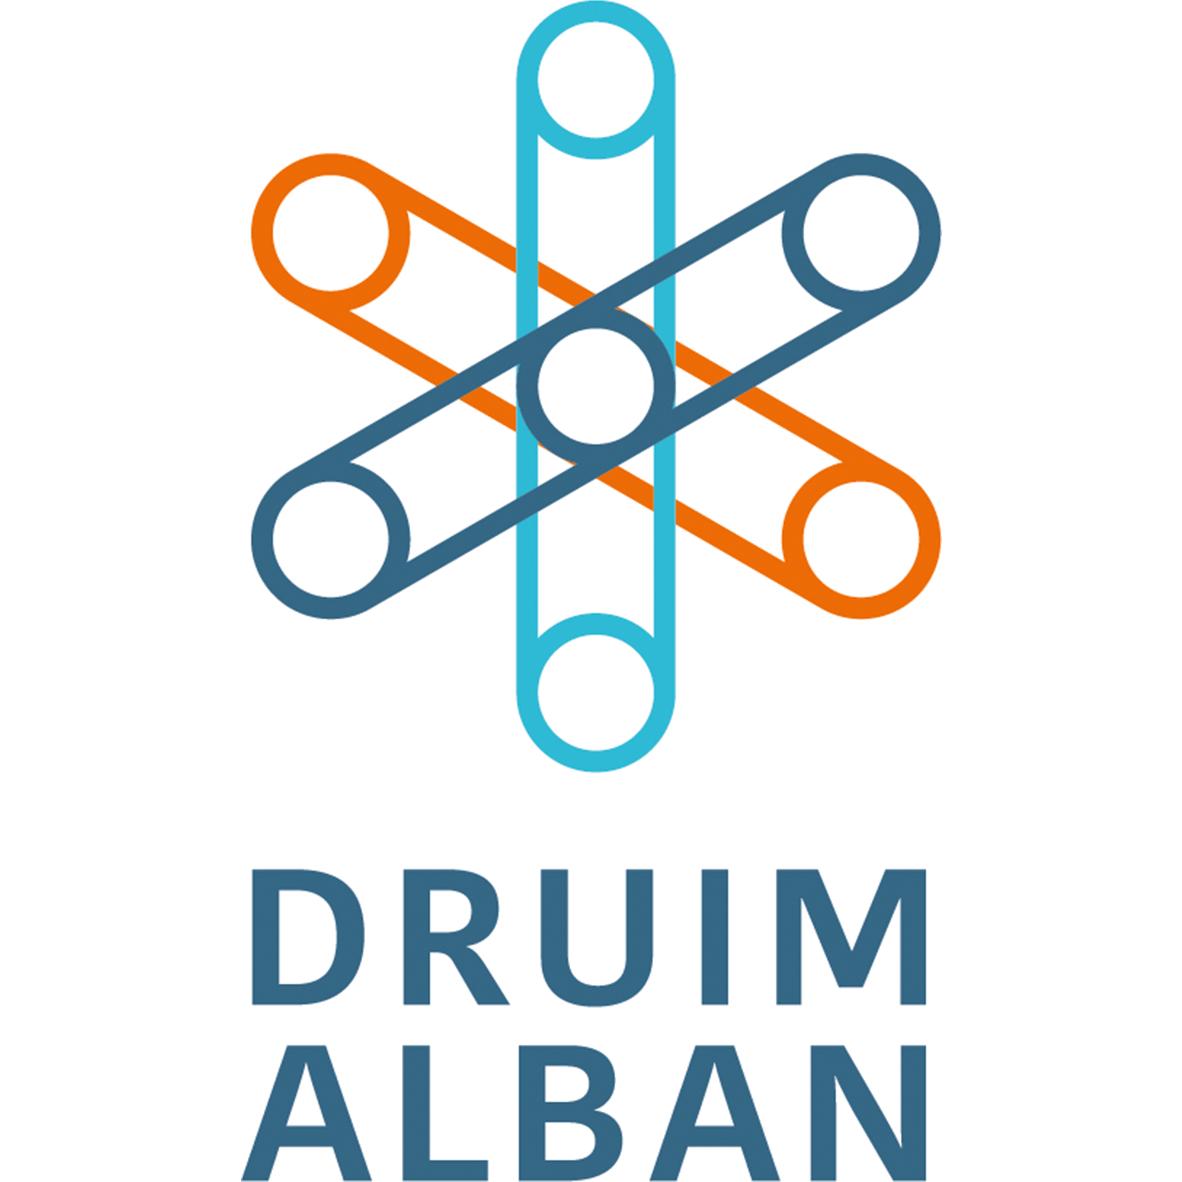 Druim Alban